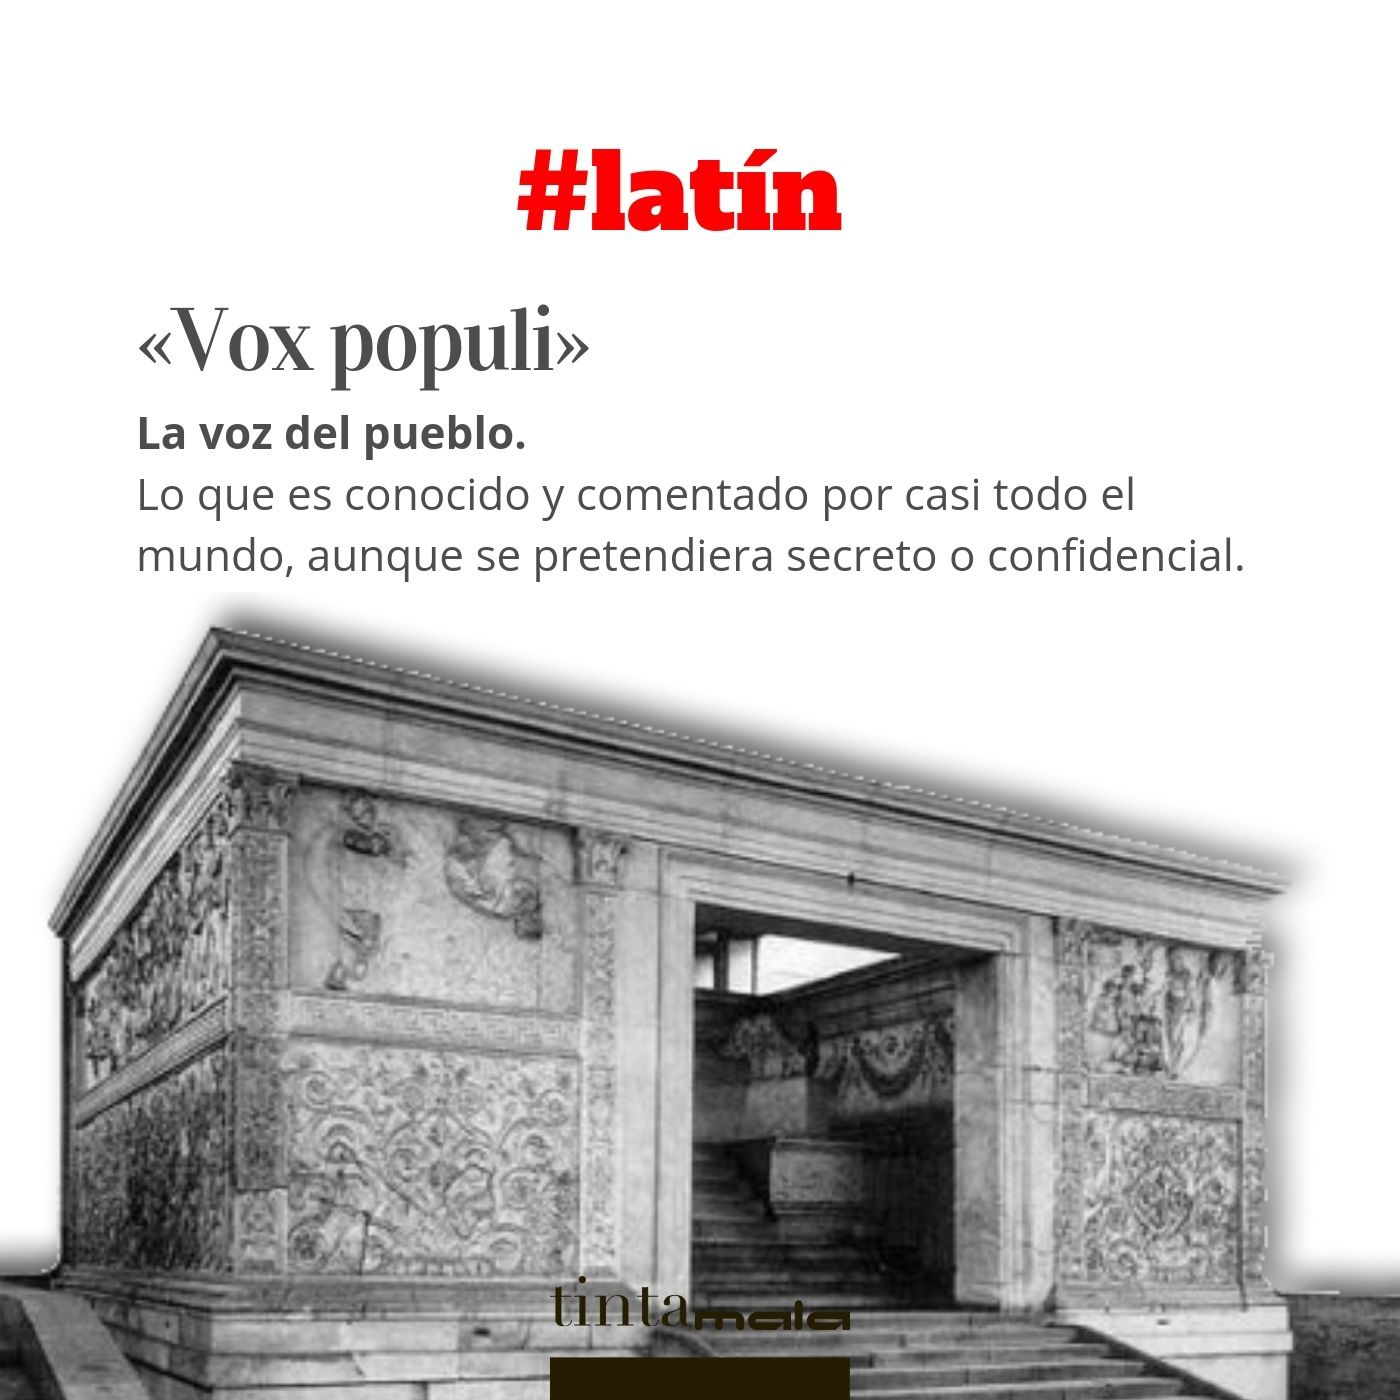 Pin De Fox En Frases En 2020 Con Imagenes Citas En Latin Palabras De Vocabulario Frases Latin Traducidas